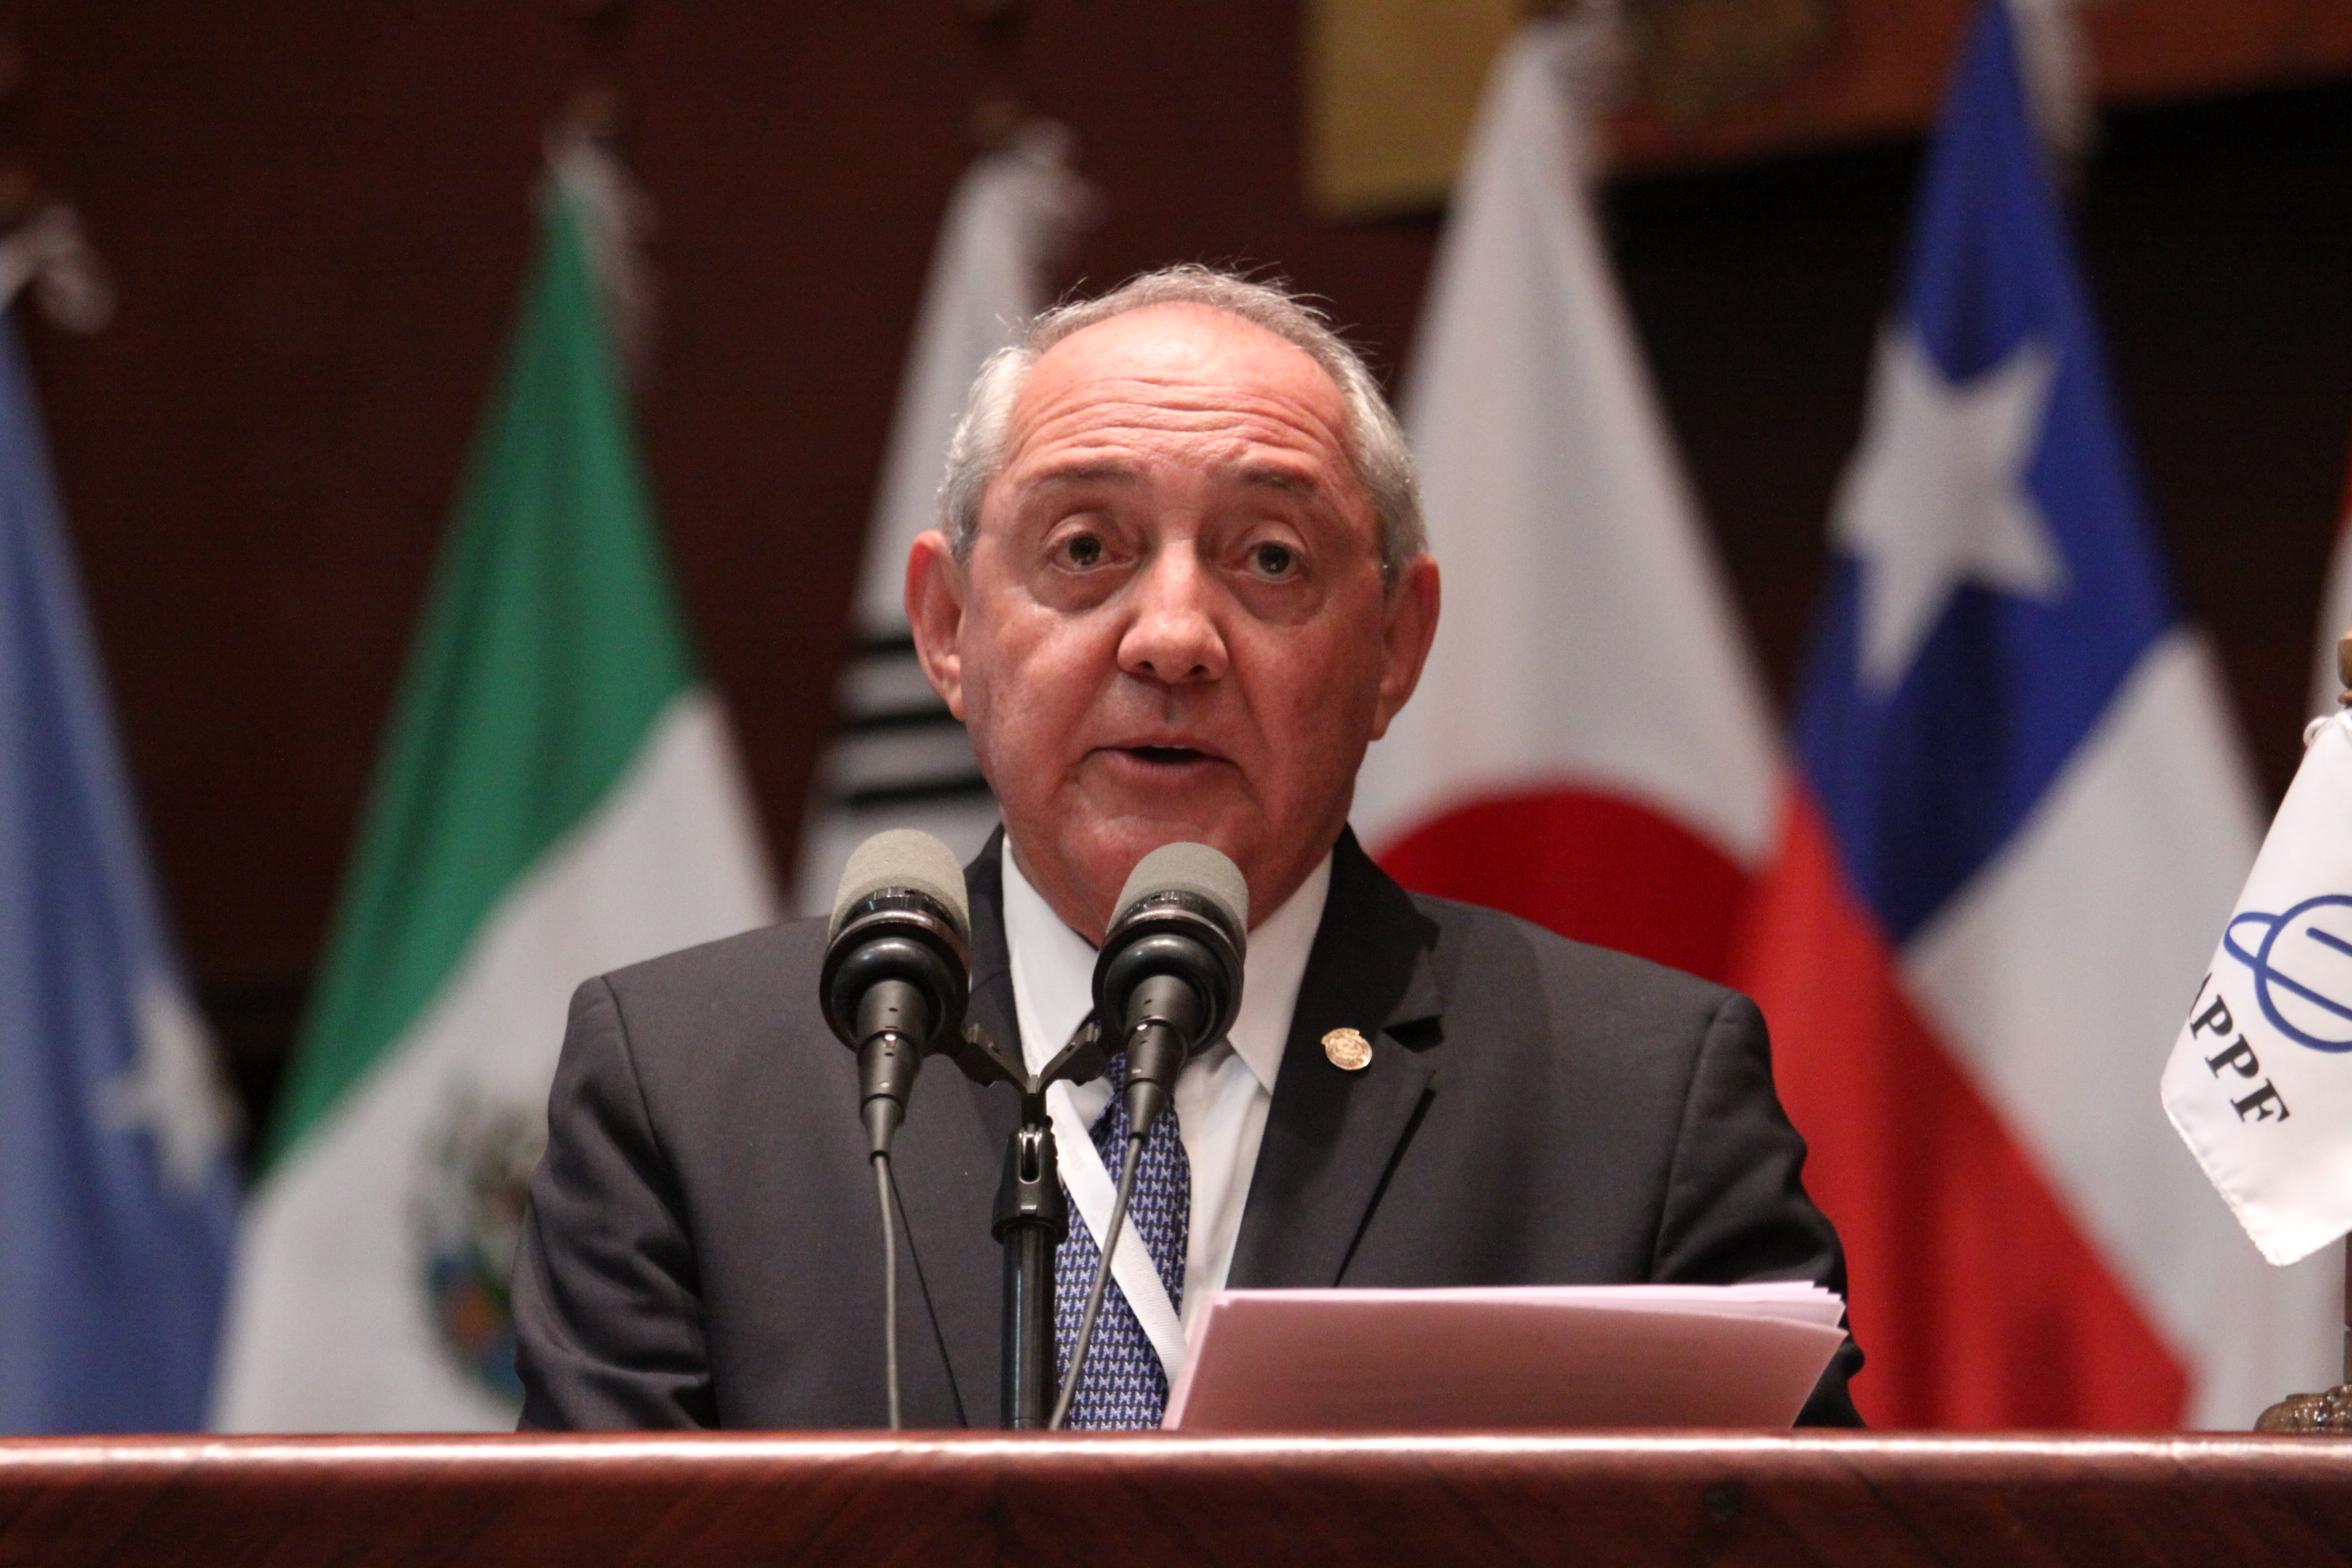 Alfonso Inzunza Montoya